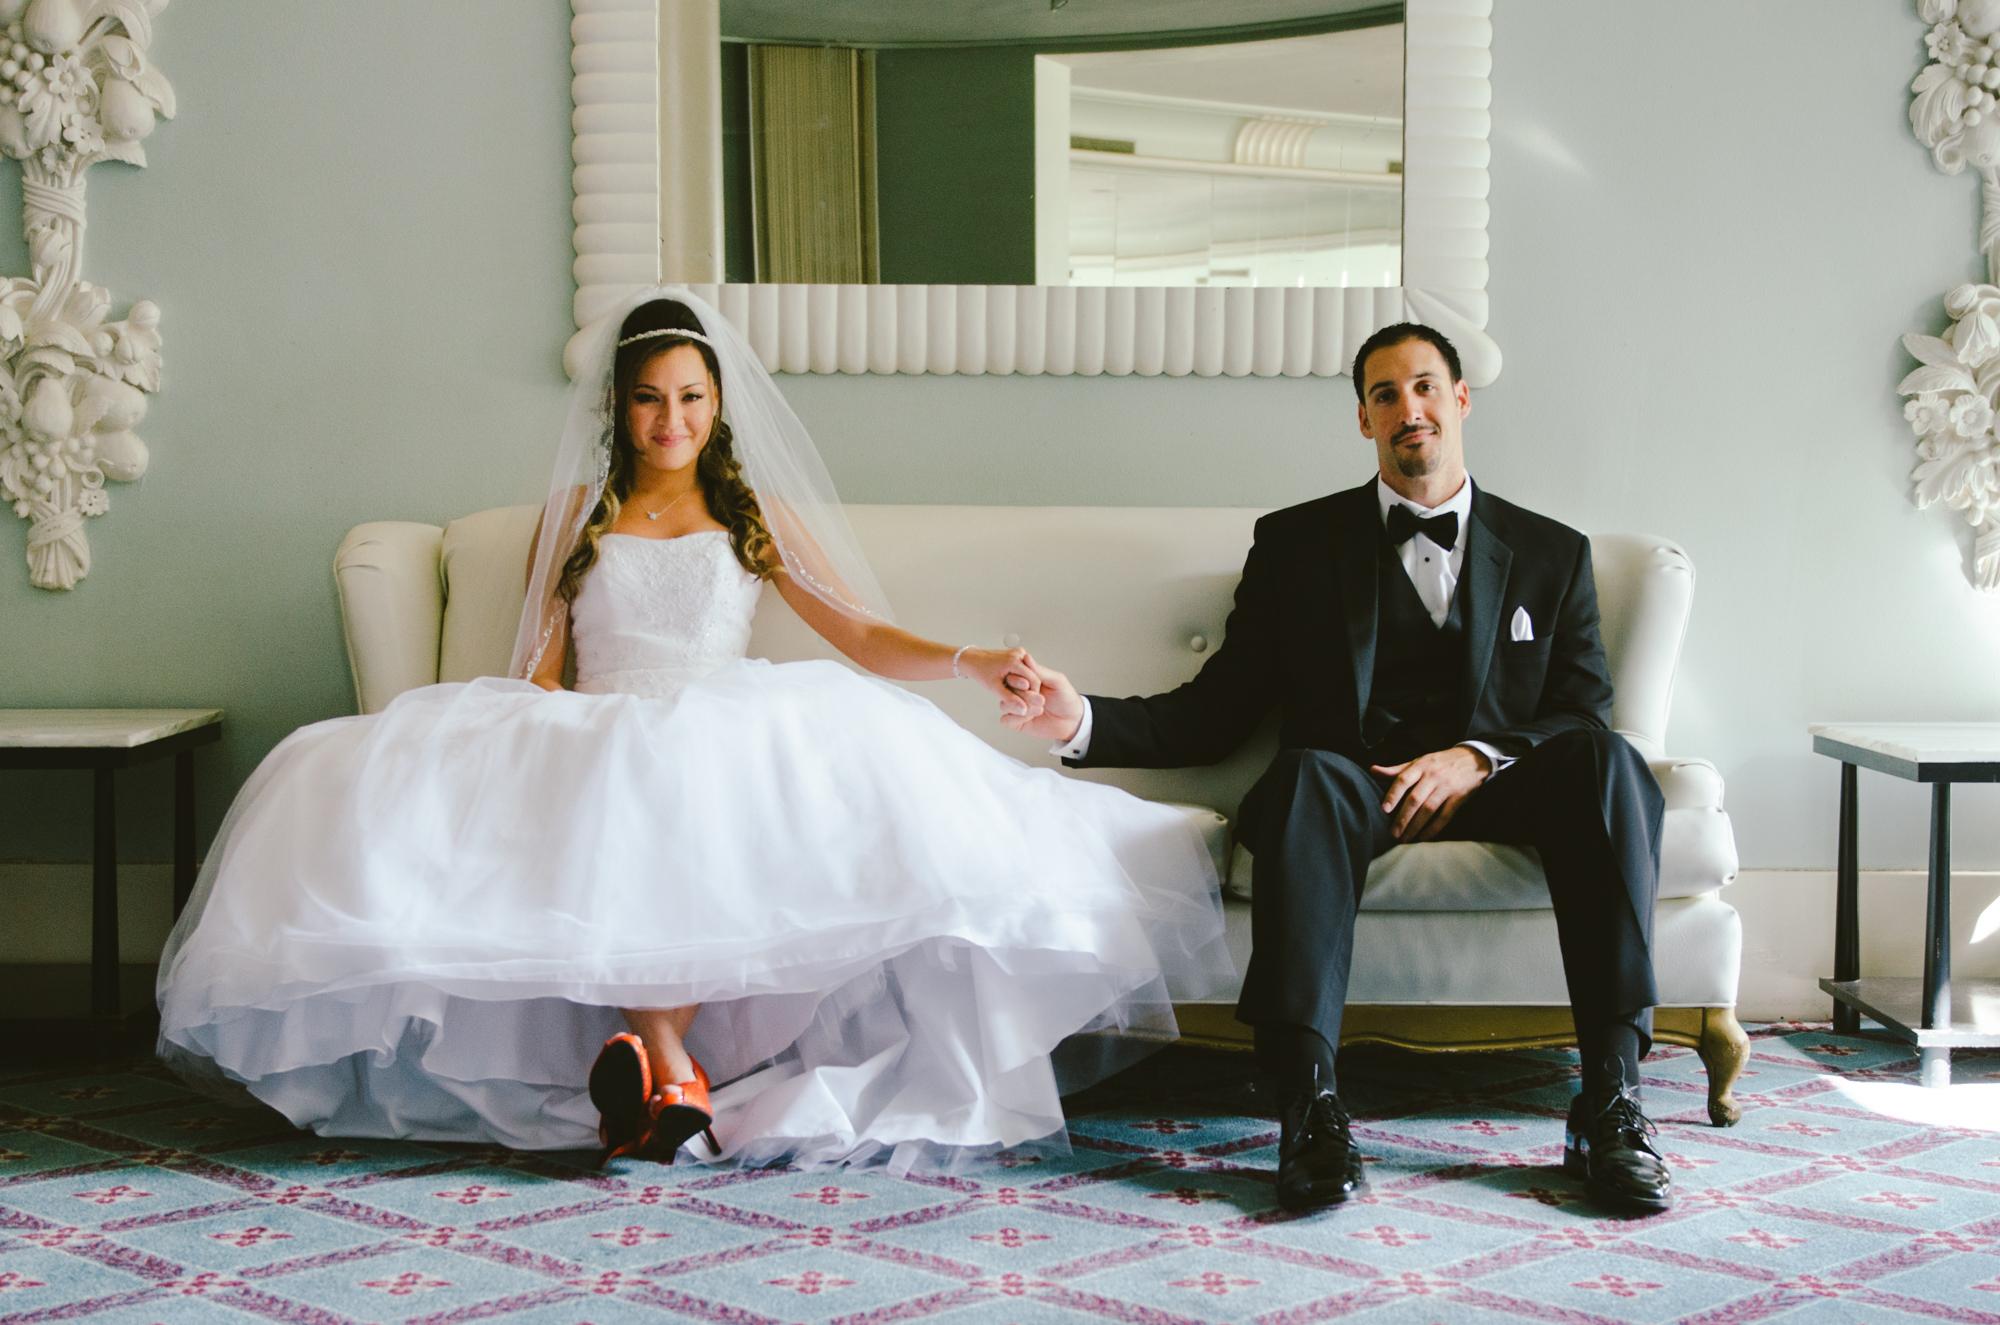 wedding_cm02.jpg